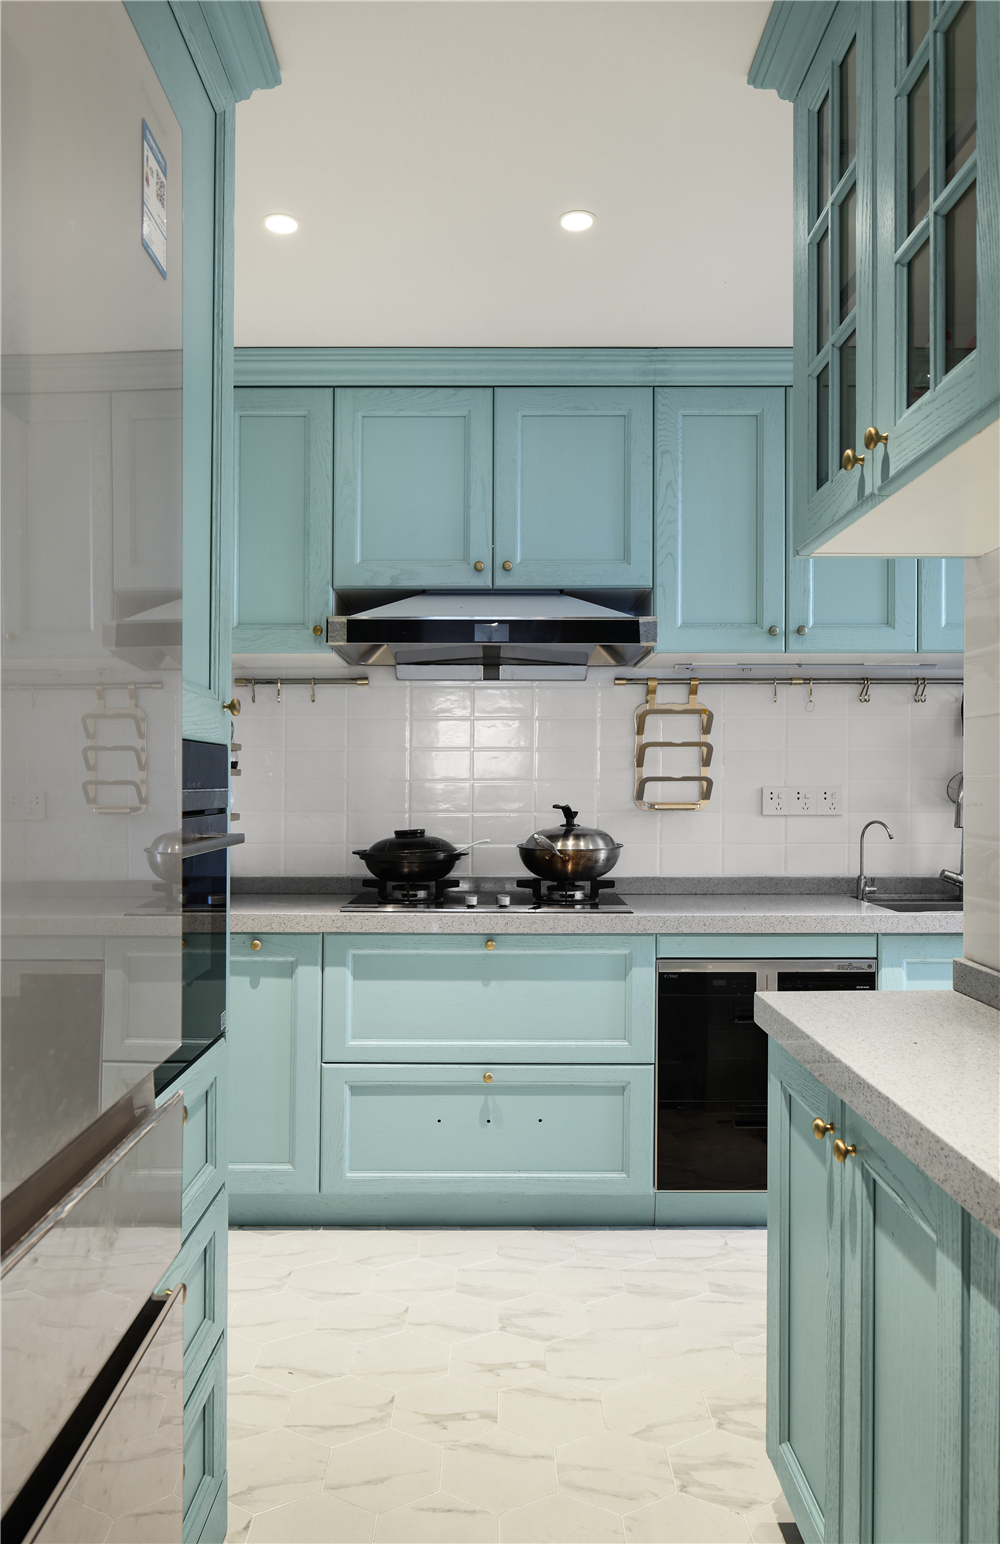 120m²美式厨房装修效果图